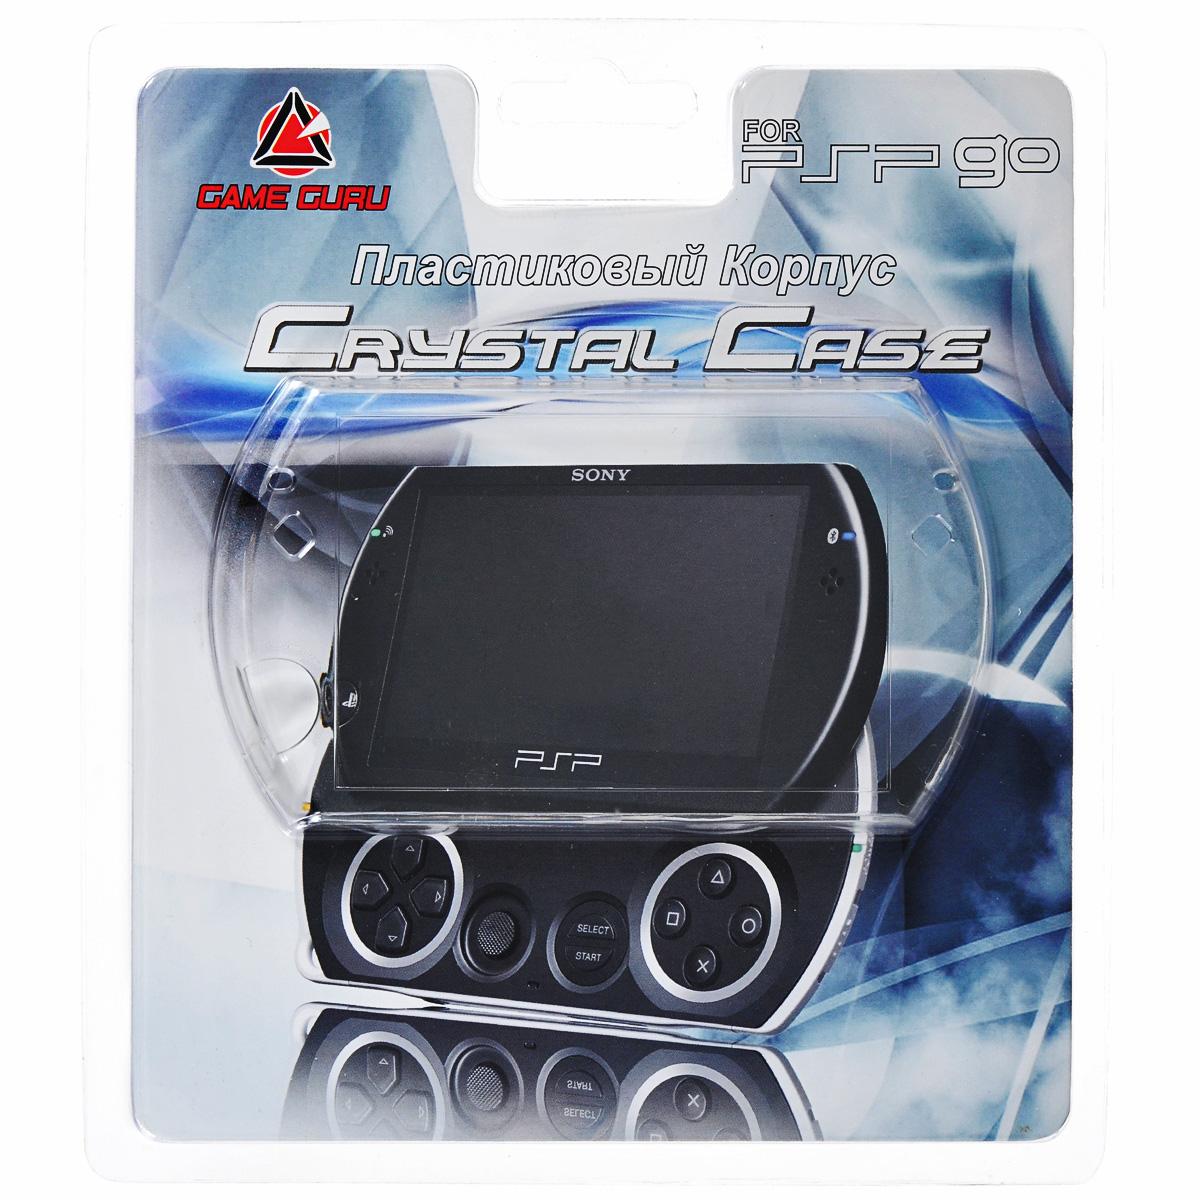 Пластиковый корпус Game Guru Crystal Case для Sony PSP GO (PSPGO-Y047)